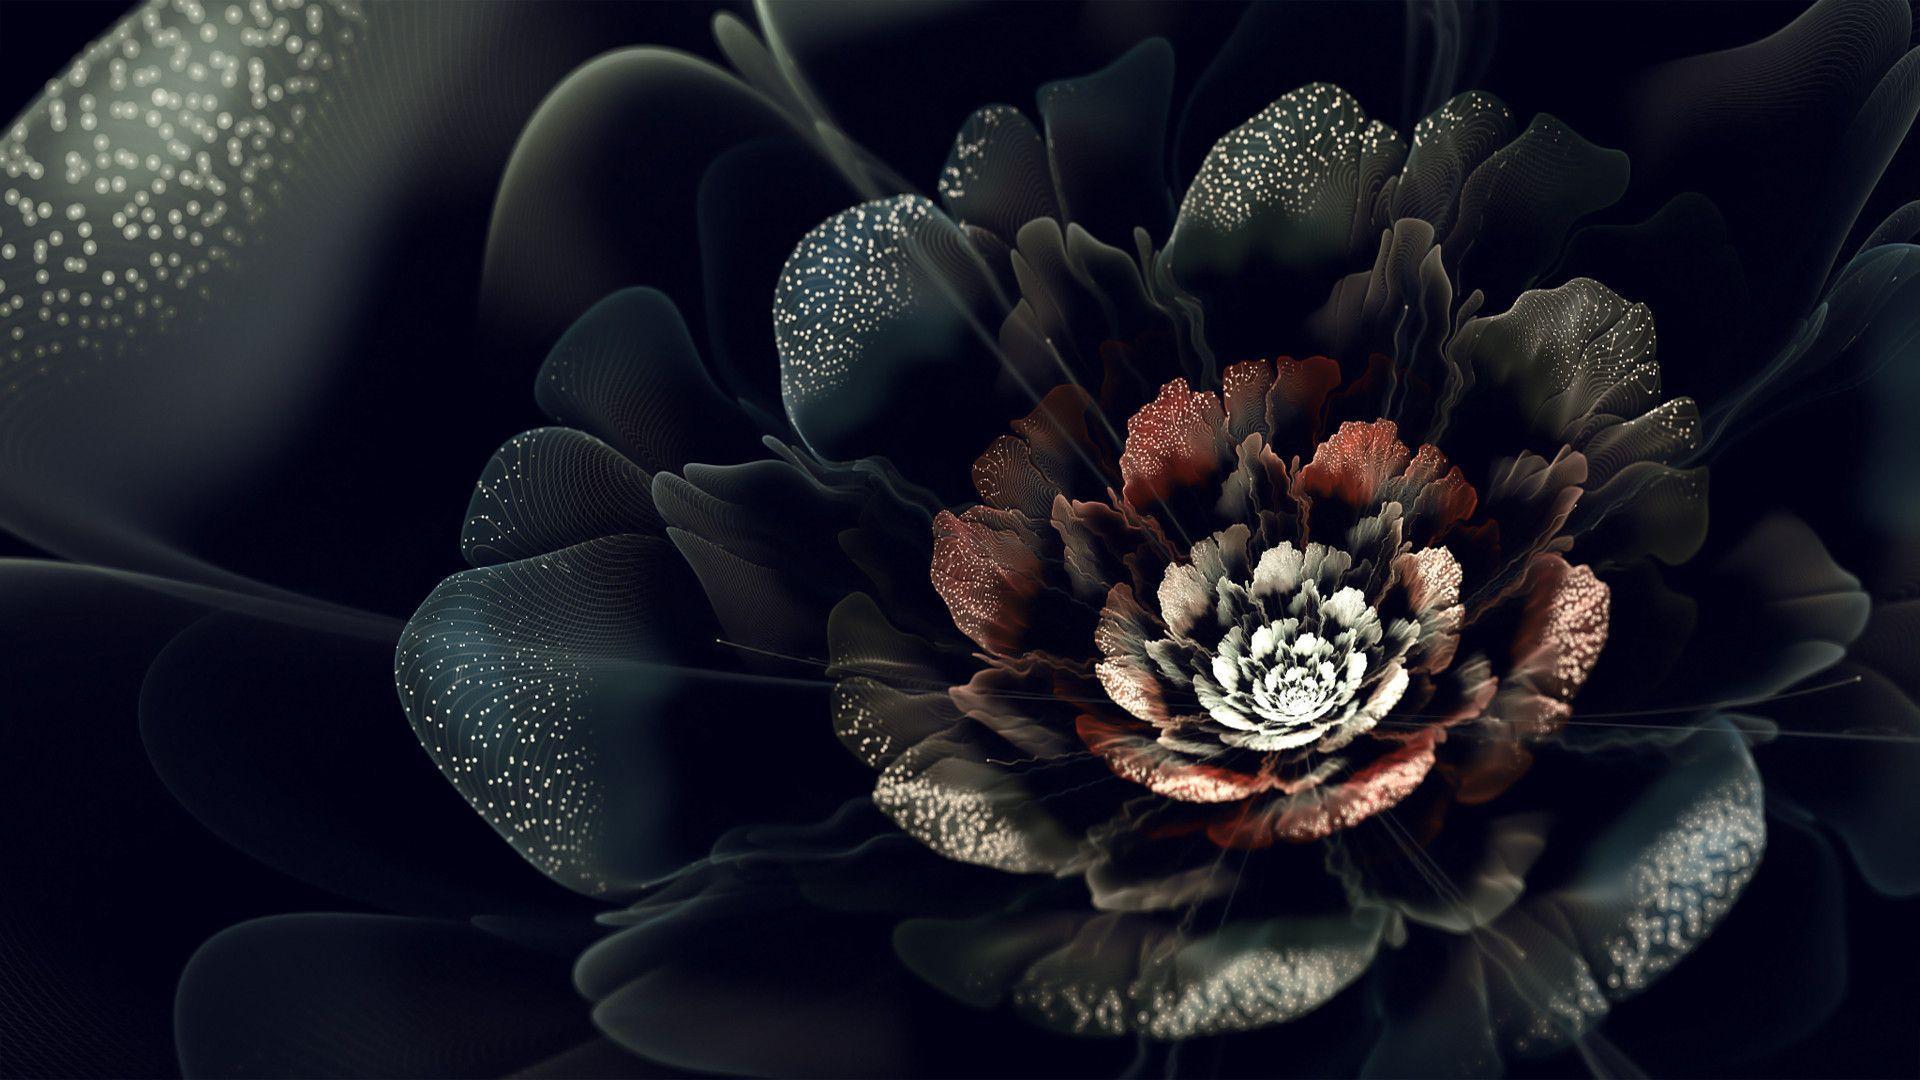 Black Flowers Wallpapers Wallpaper Cave